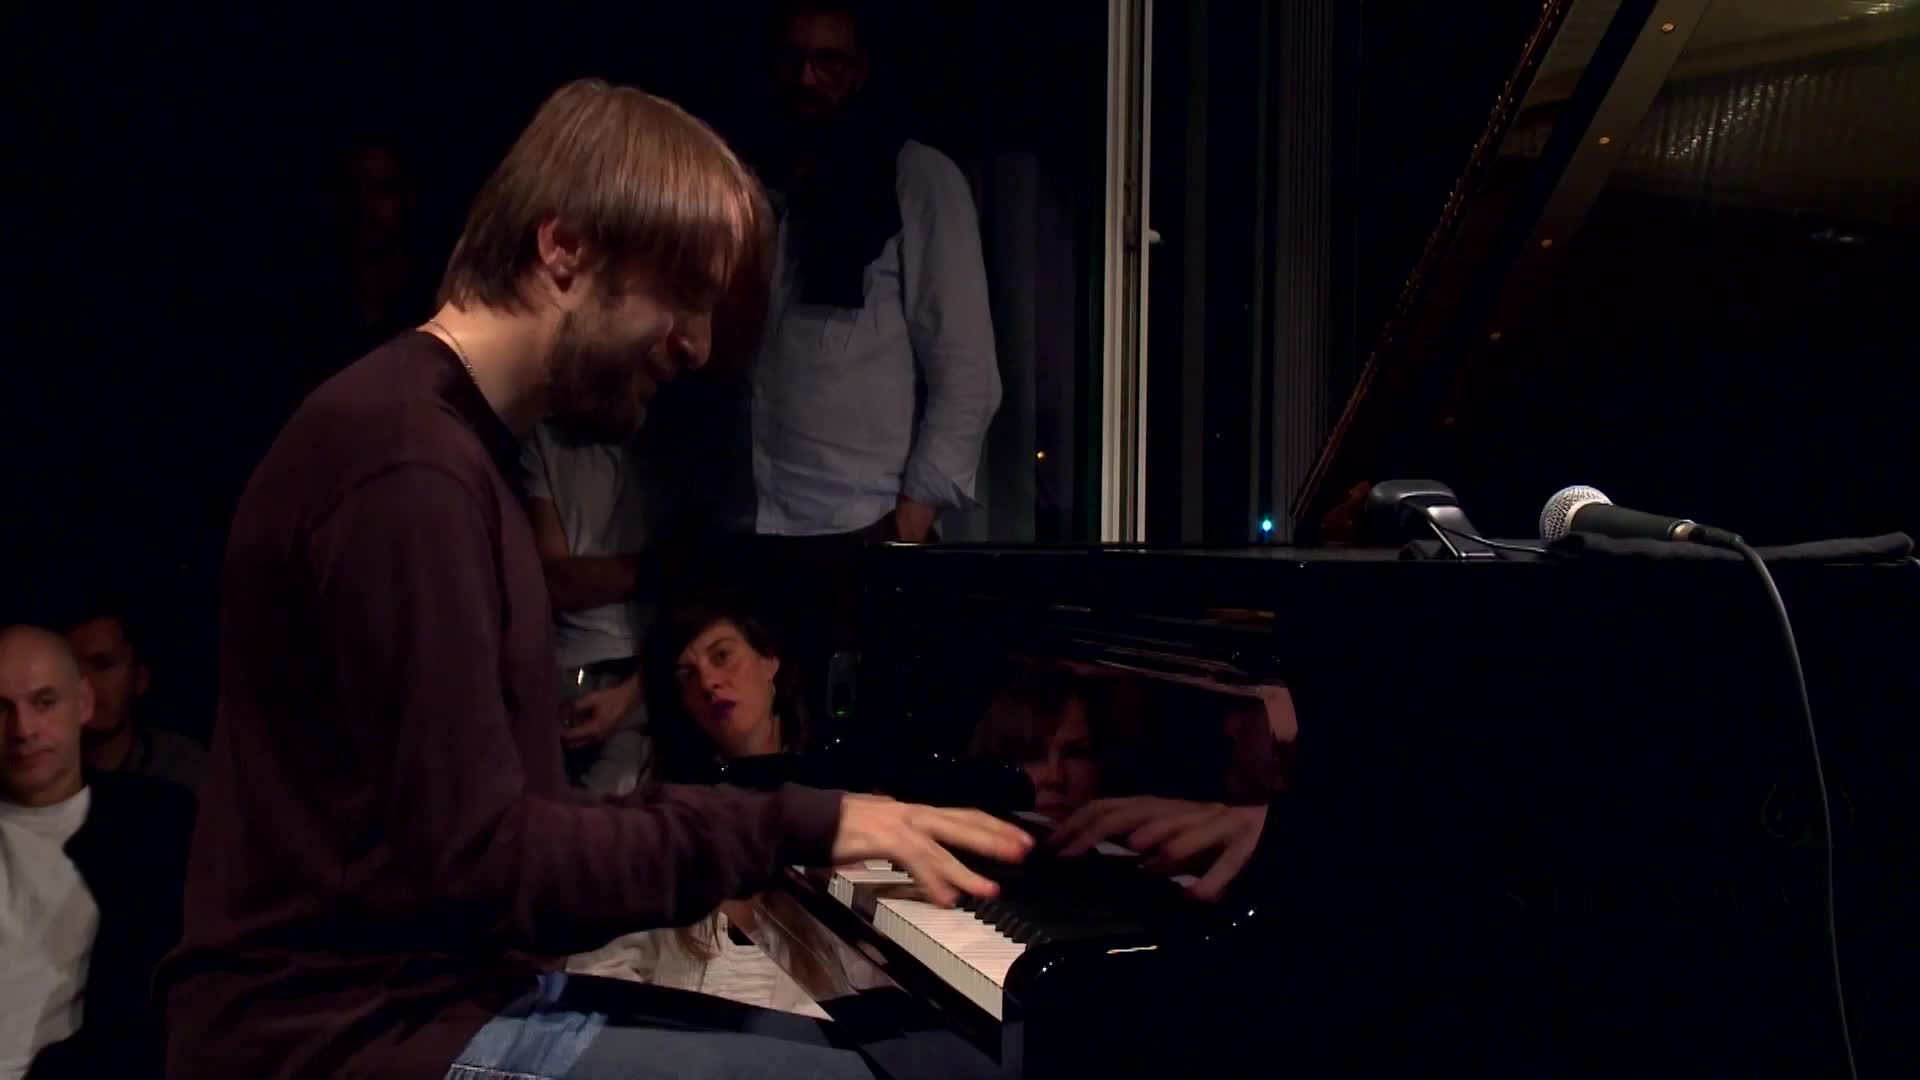 Daniil Trifonov, Zu Gast in der Yellow Lounge Berlin